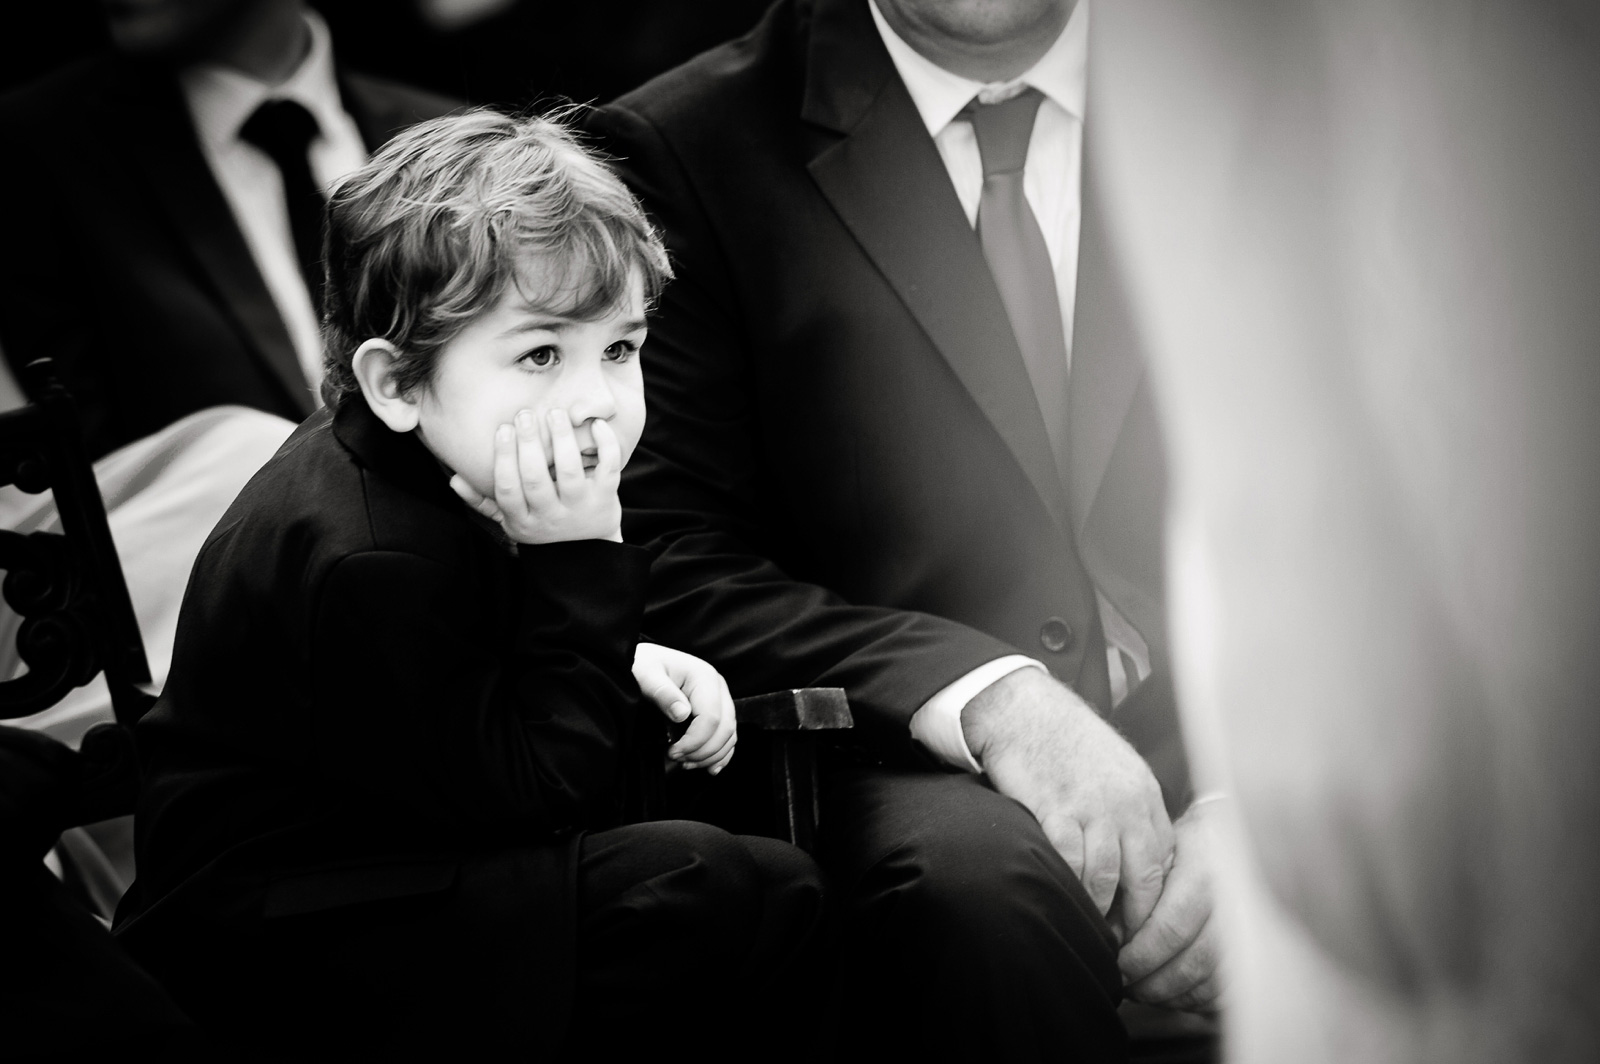 Bored child at wedding